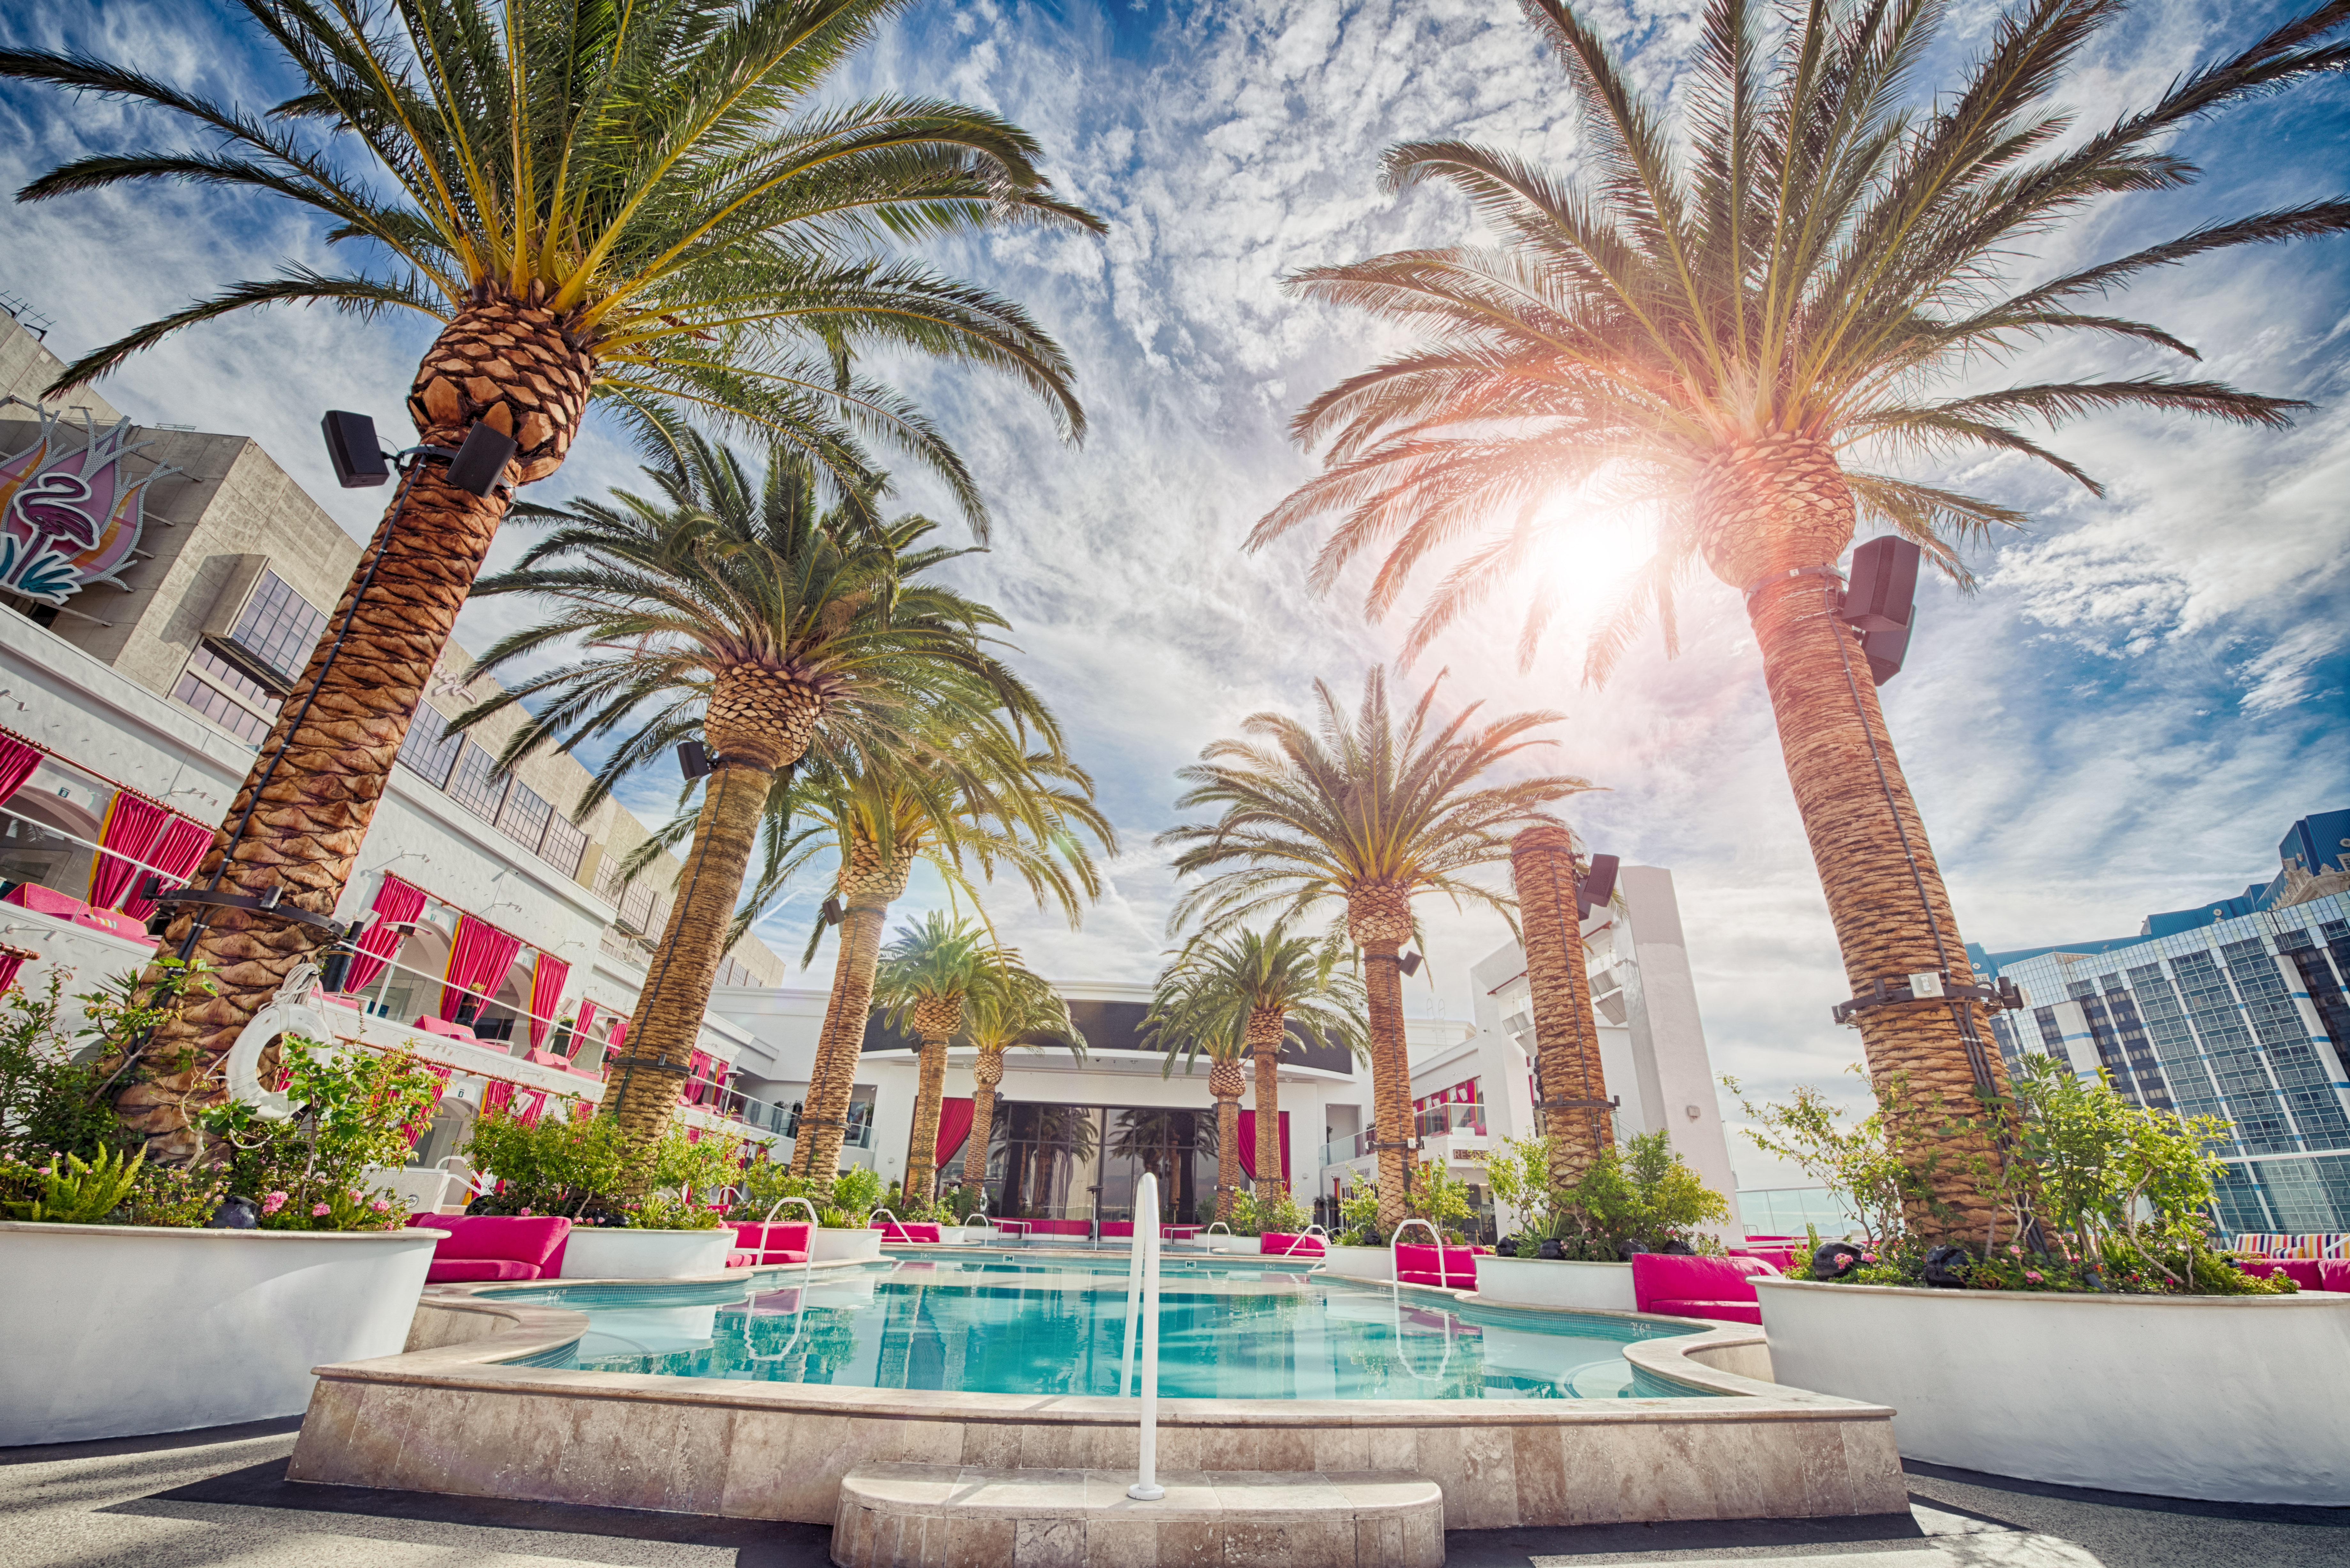 holiday vacation hotel luxury money after graduation